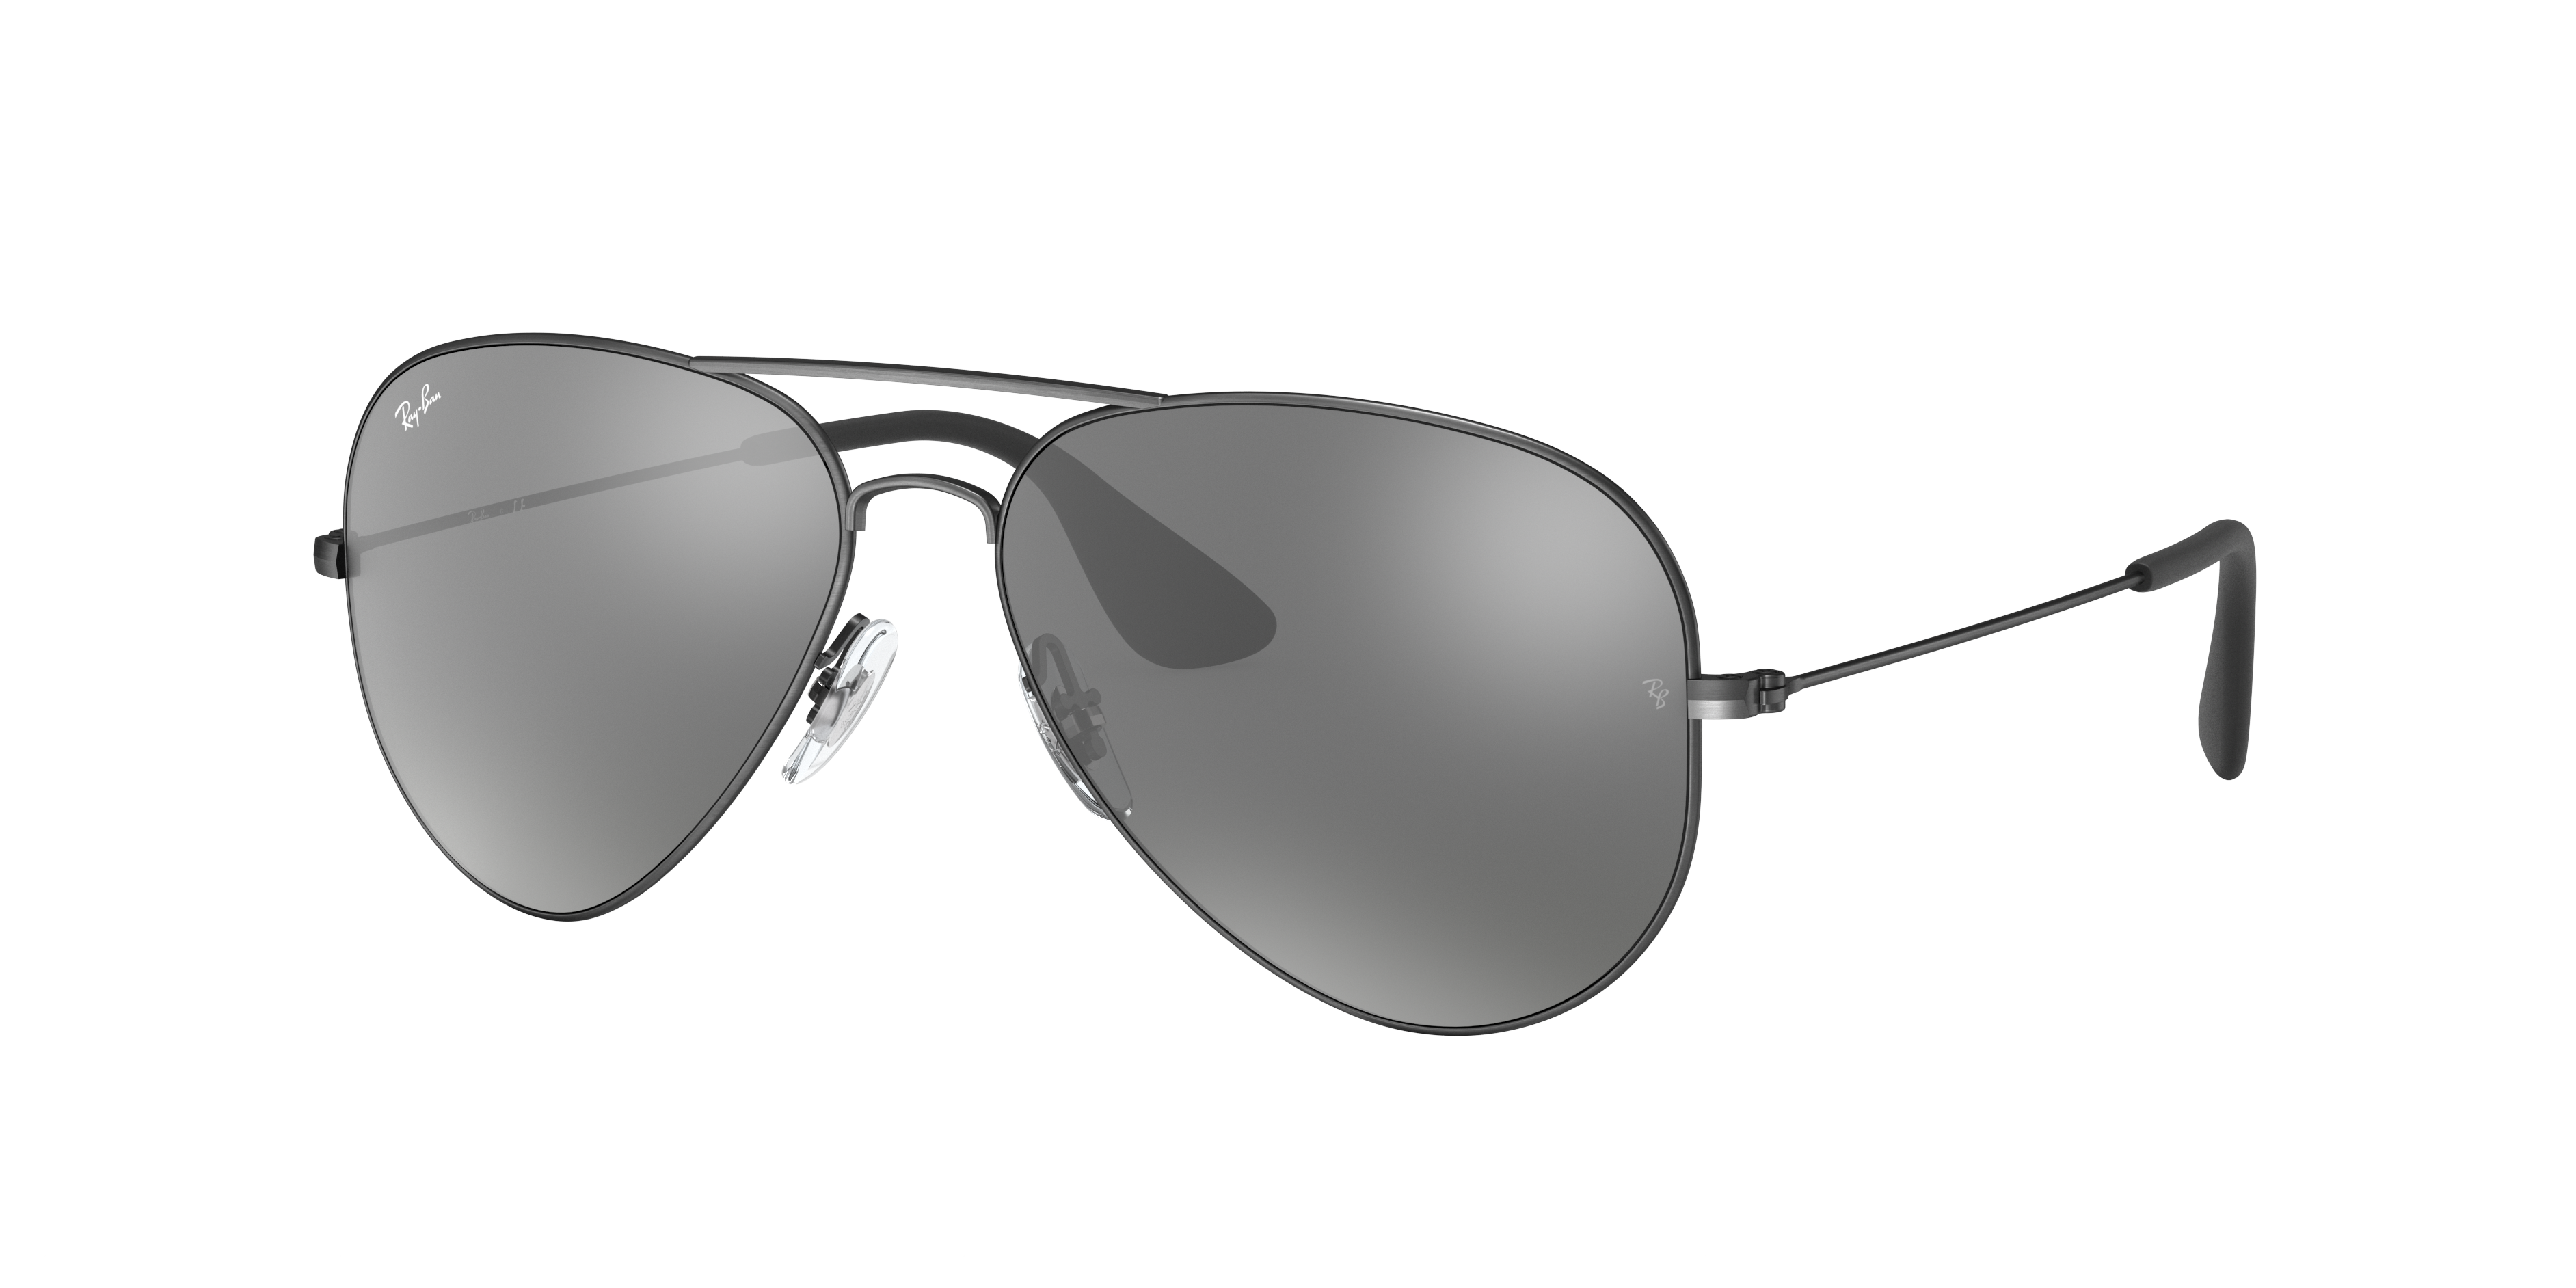 Ray-Ban Rb3558 Black, Gray Lenses - RB3558